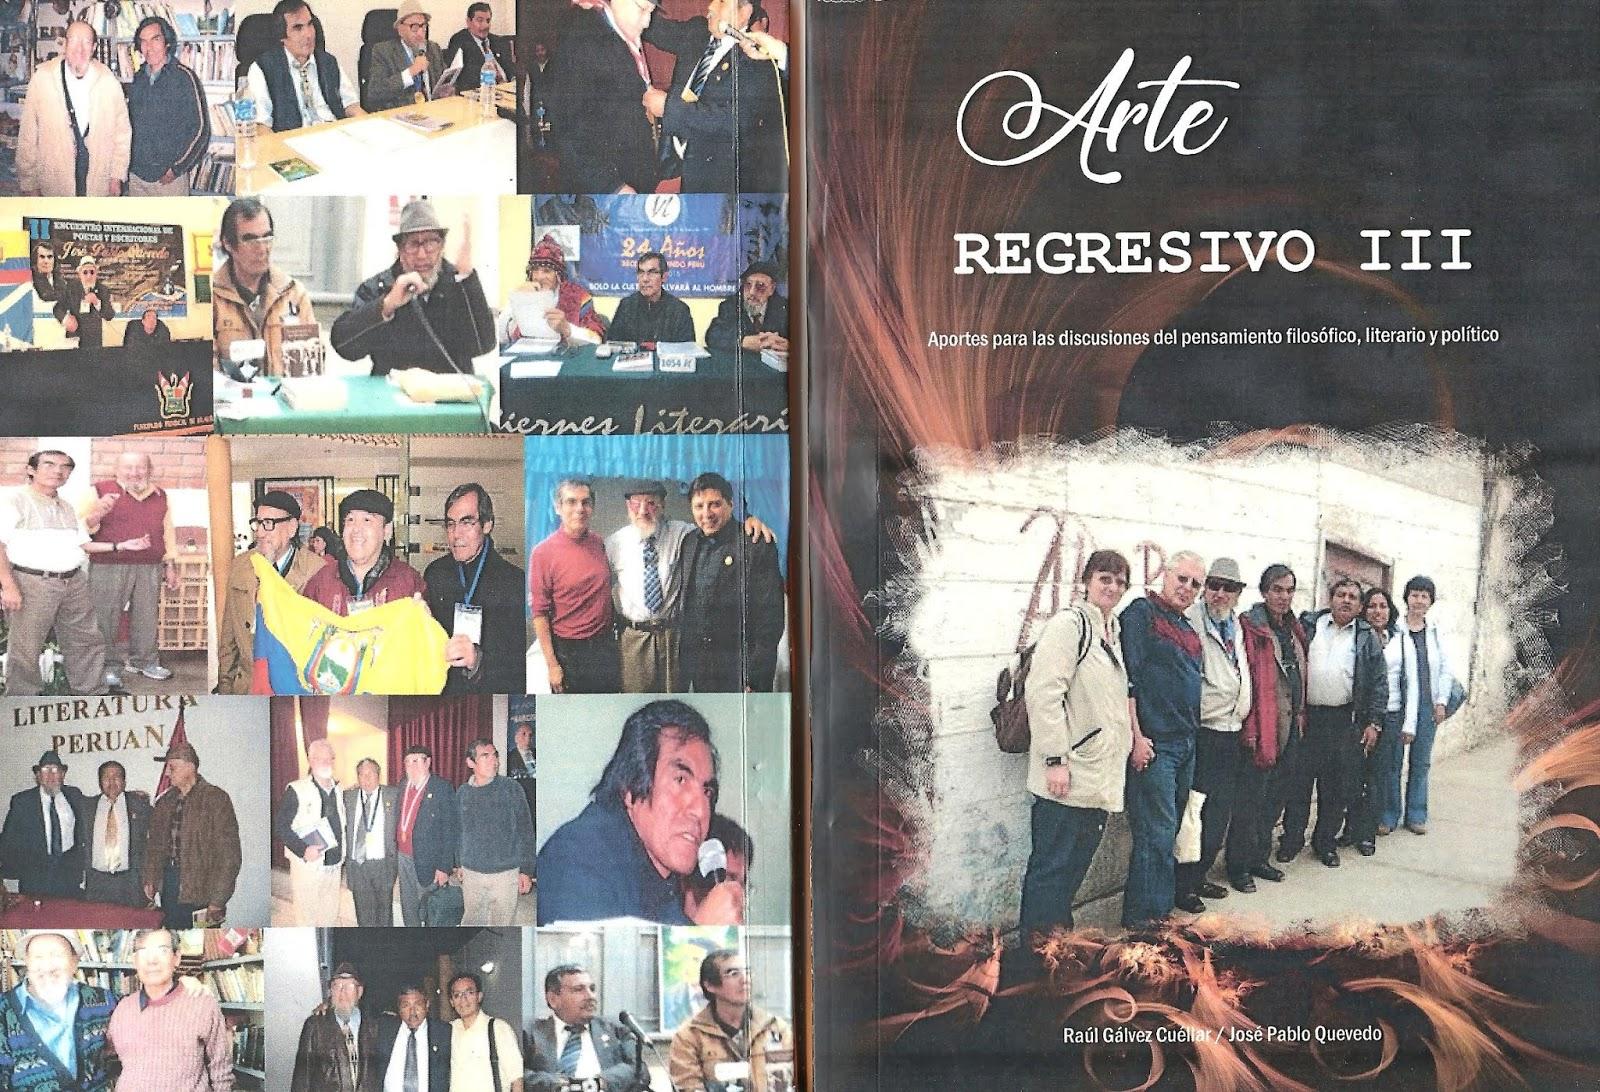 ARTE REGRESIVO III